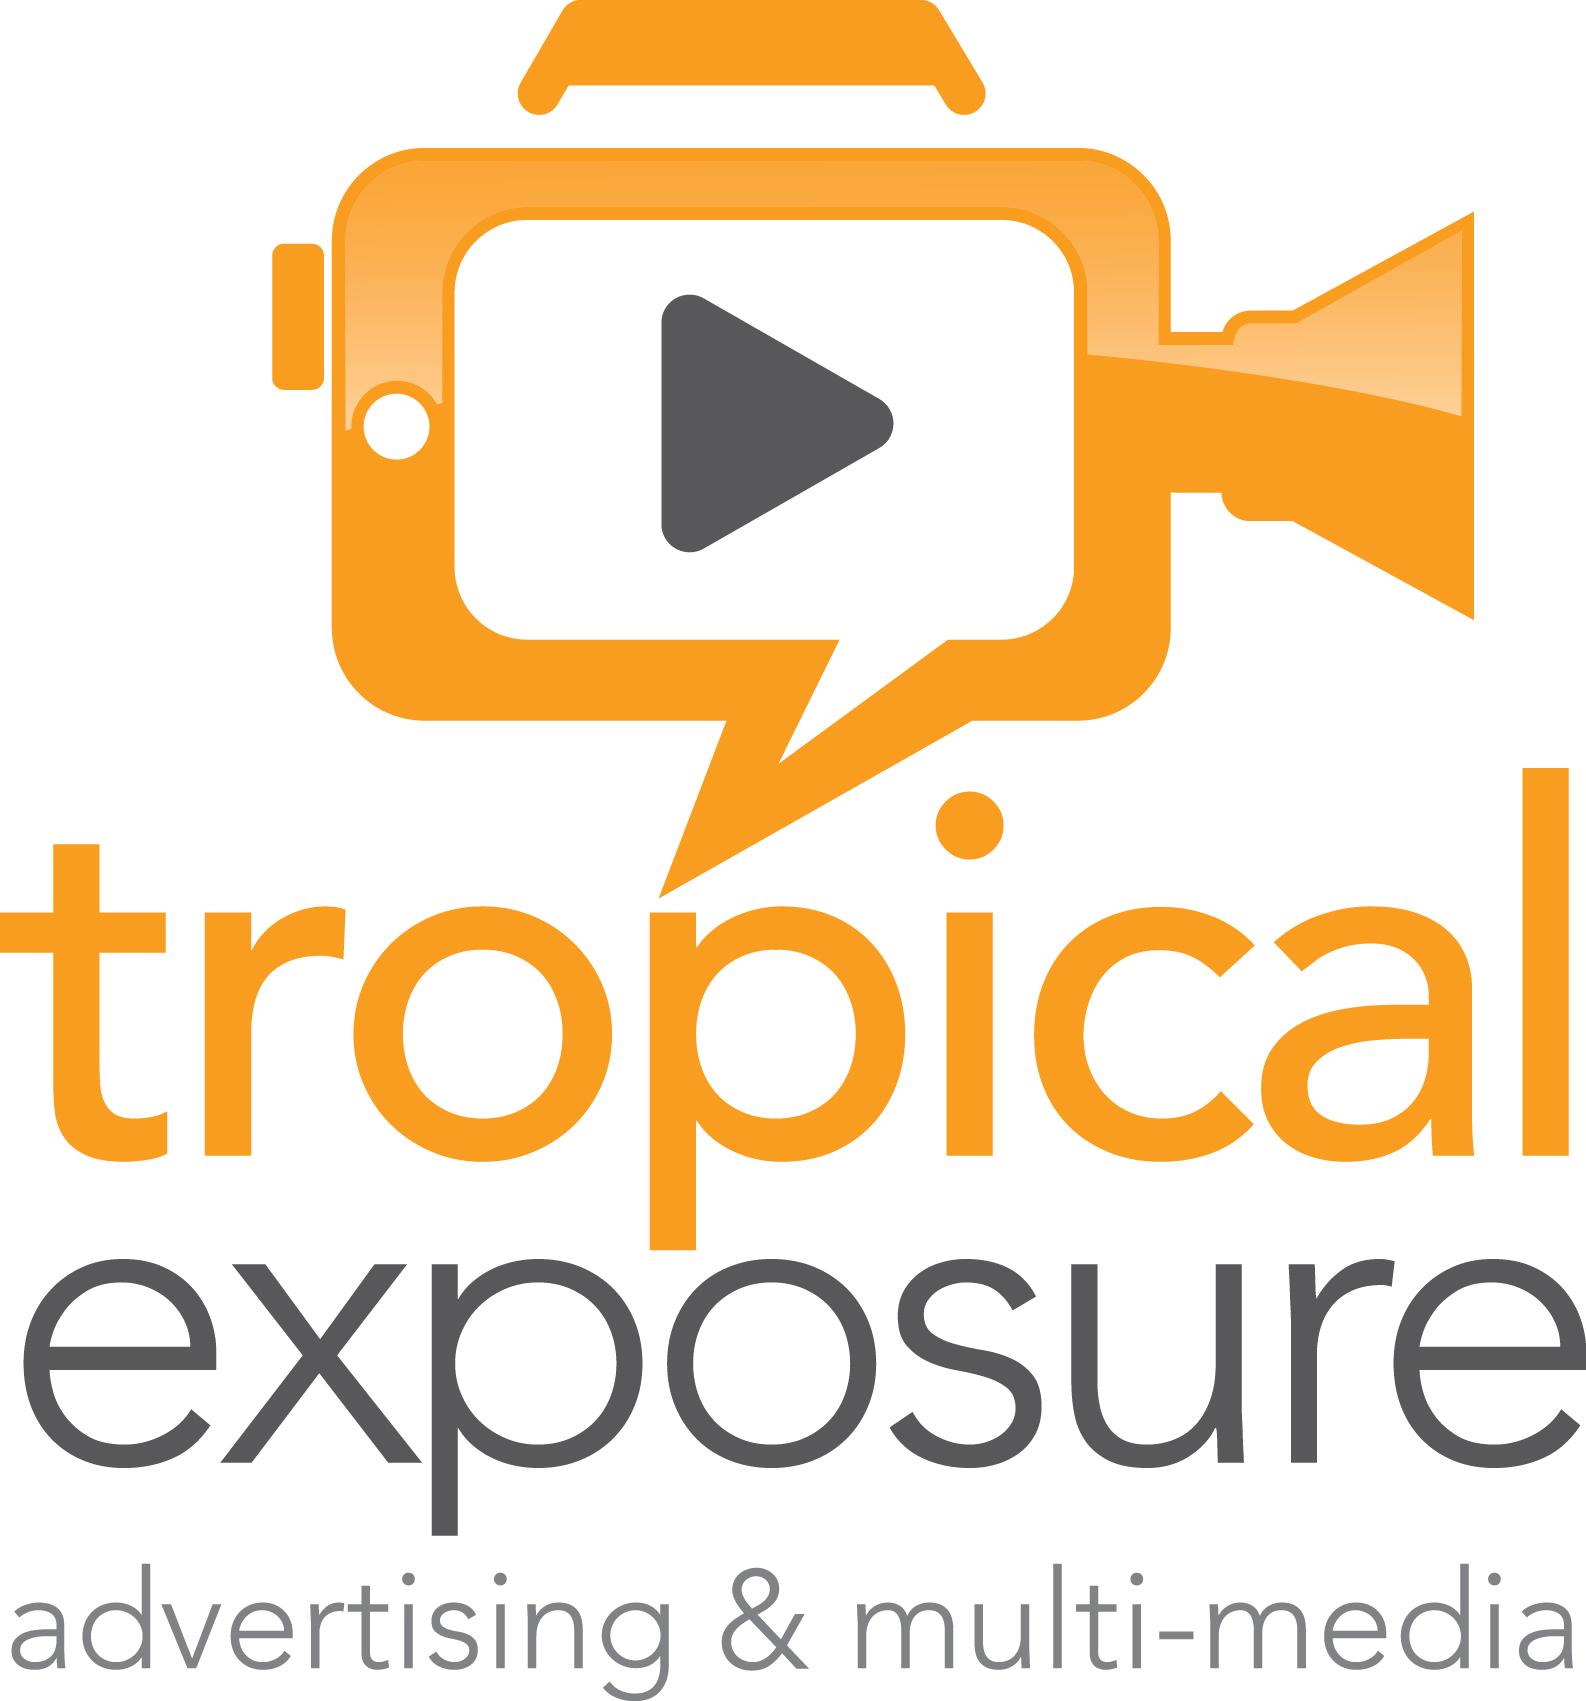 tropical-exposure